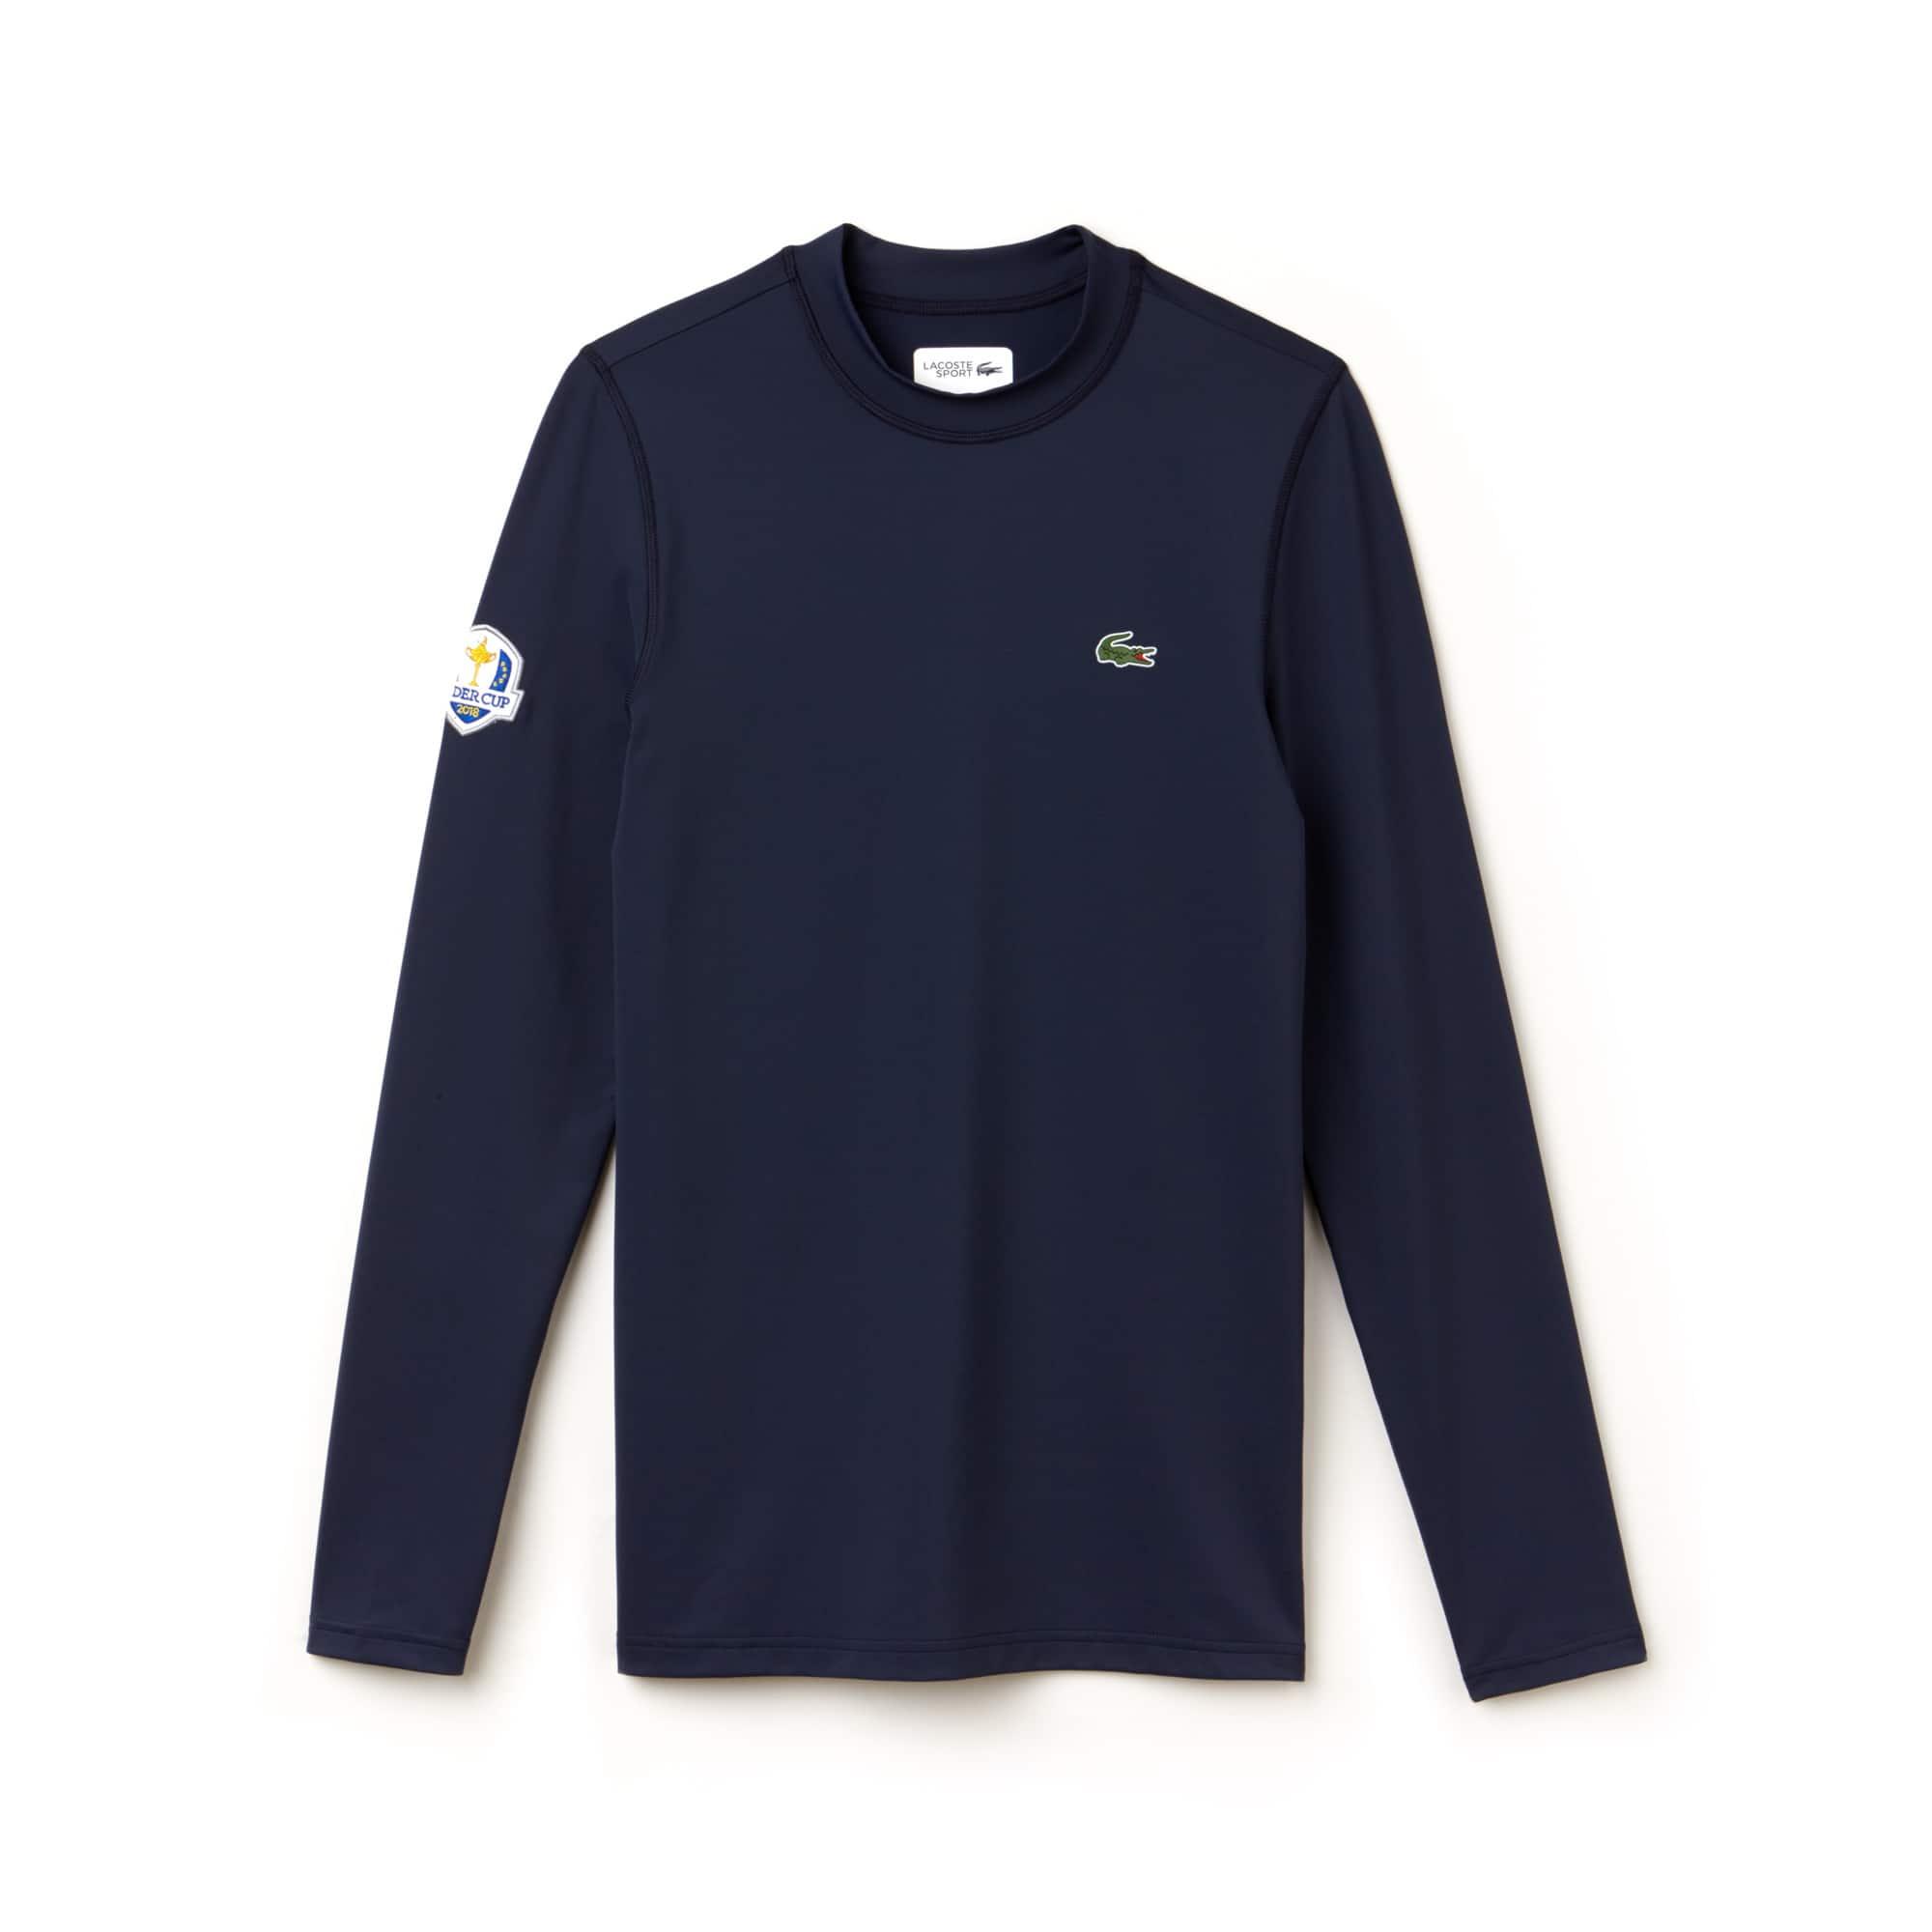 Men's Lacoste SPORT Ryder Cup Edition Jersey Golf T-shirt